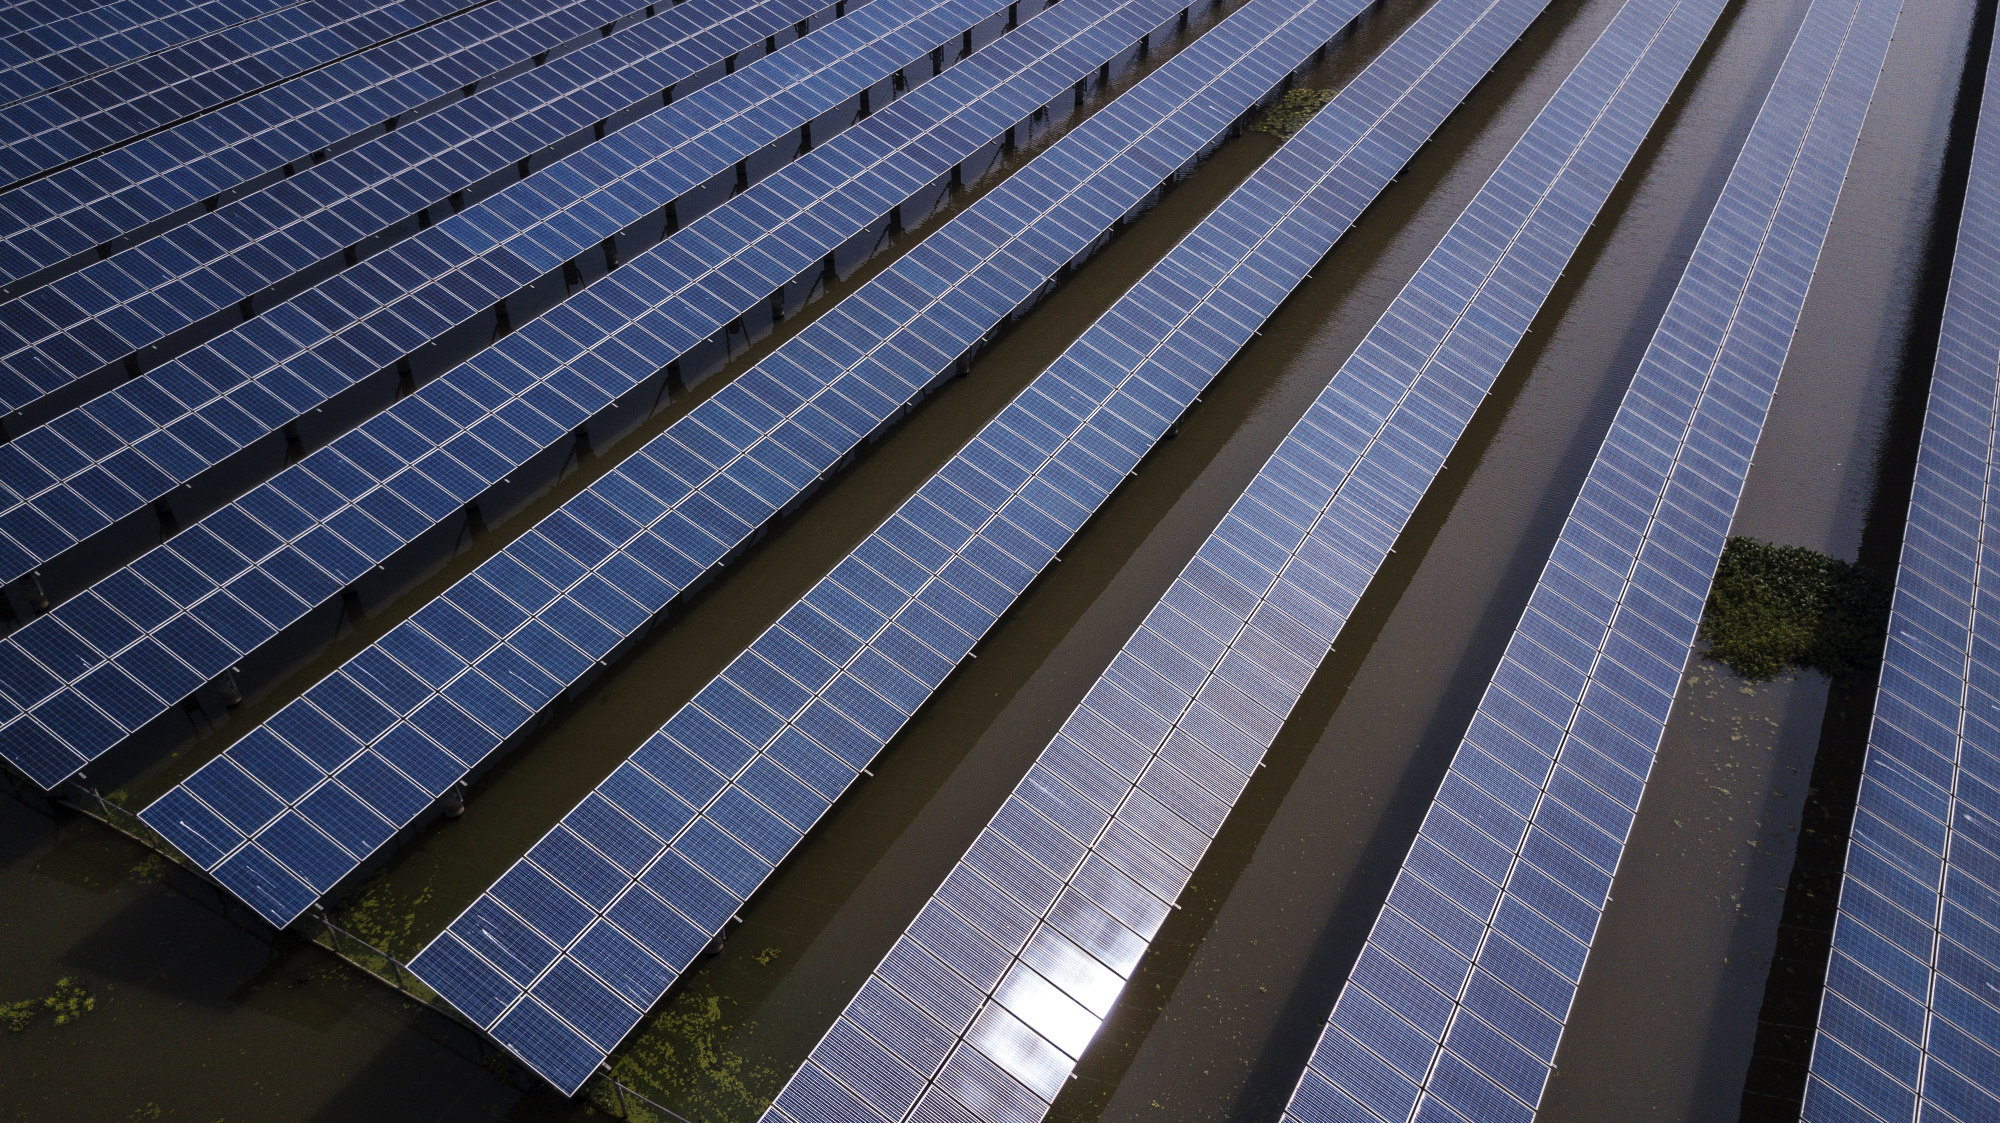 bloomberg.com - Jim Efstathiou Jr - Global Clean Energy Funding Dips 8% as China Cools Solar Boom